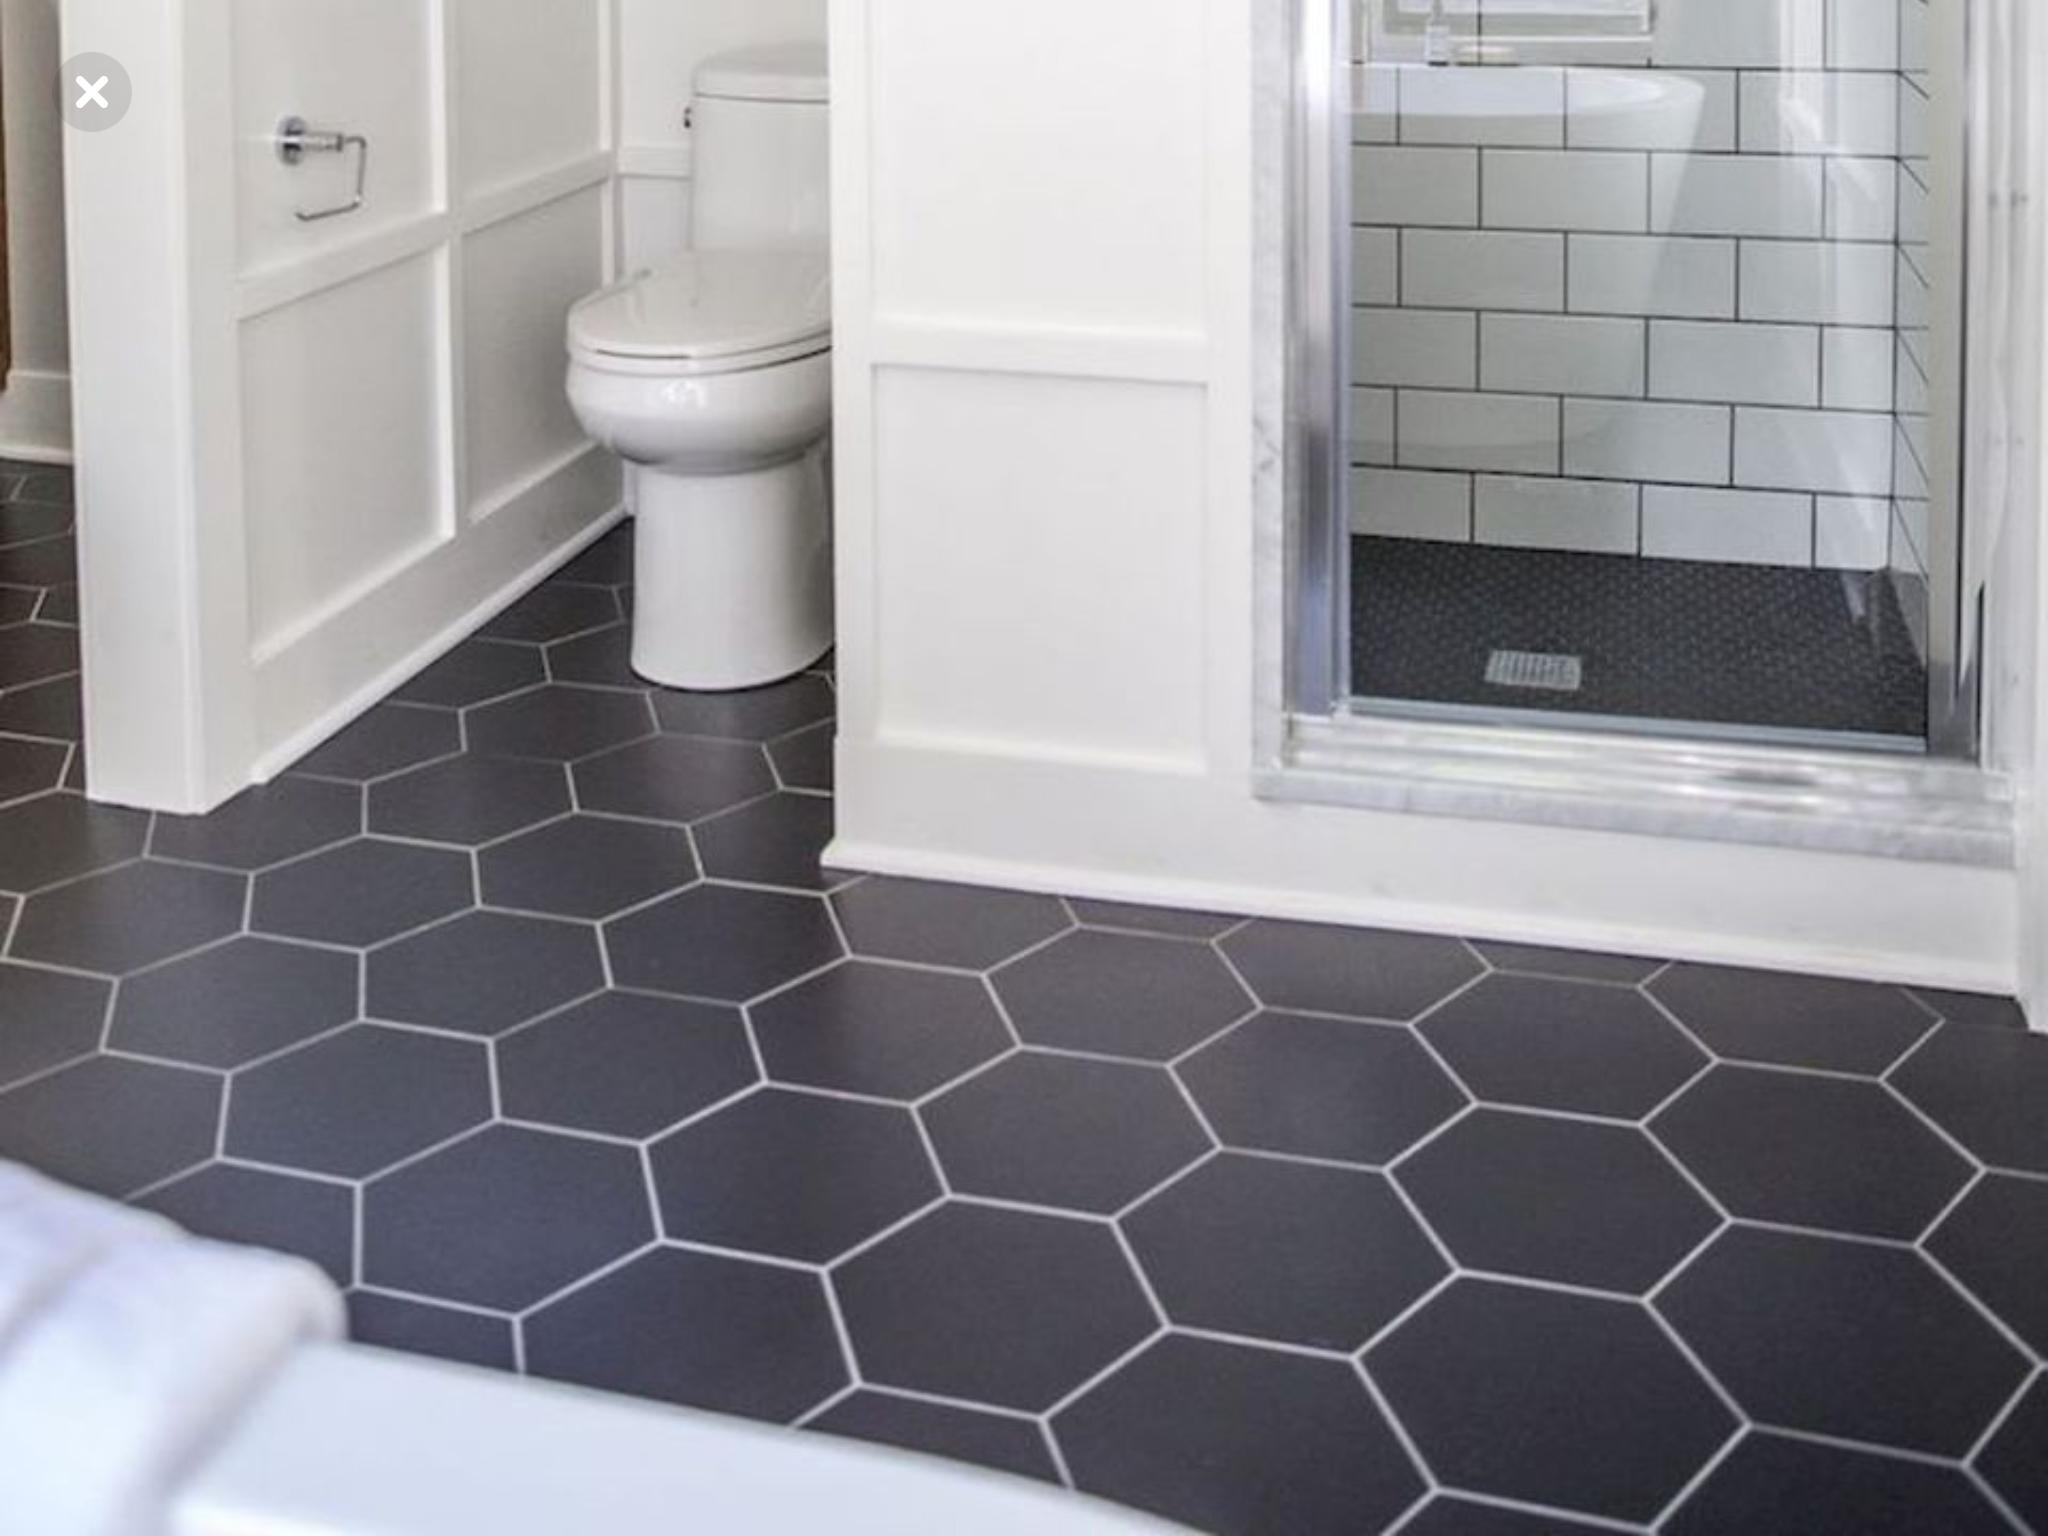 Dark Hexagon Tile And Subway Shower Tile With Dark Grout Honeycomb Tile Bathroom Floor Honeycomb Tile Floor Bathroom Floor Tiles